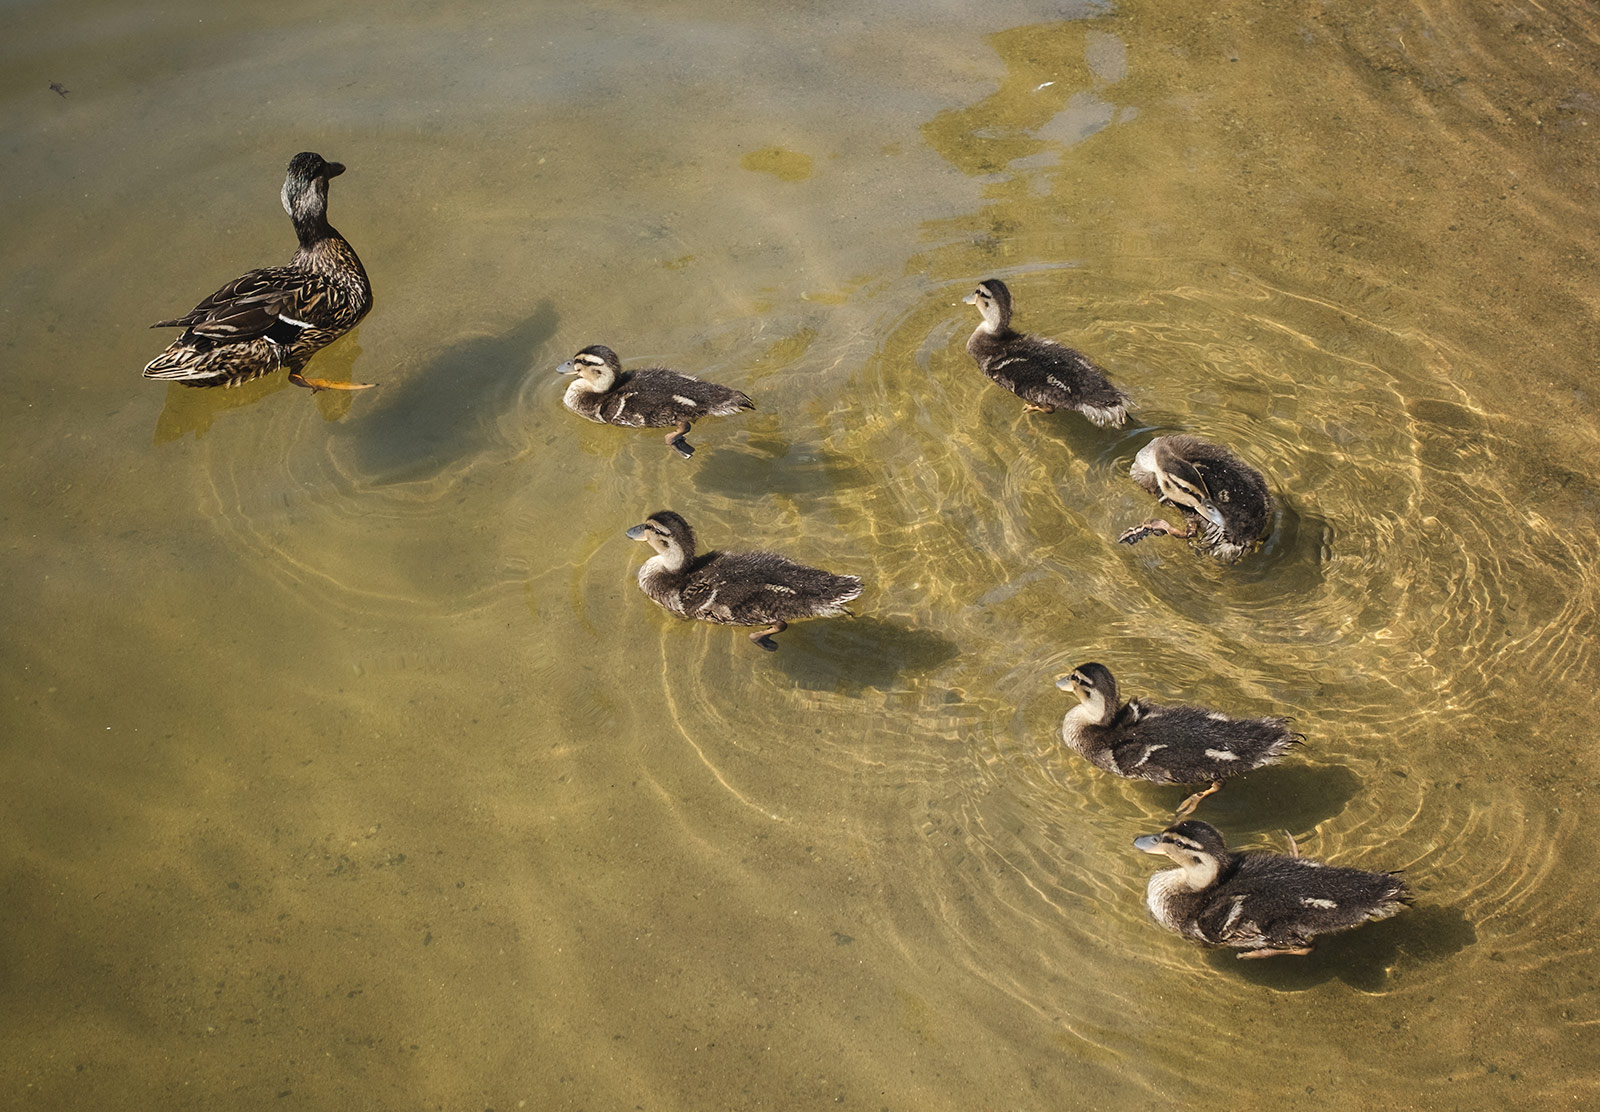 Swimming ducklings